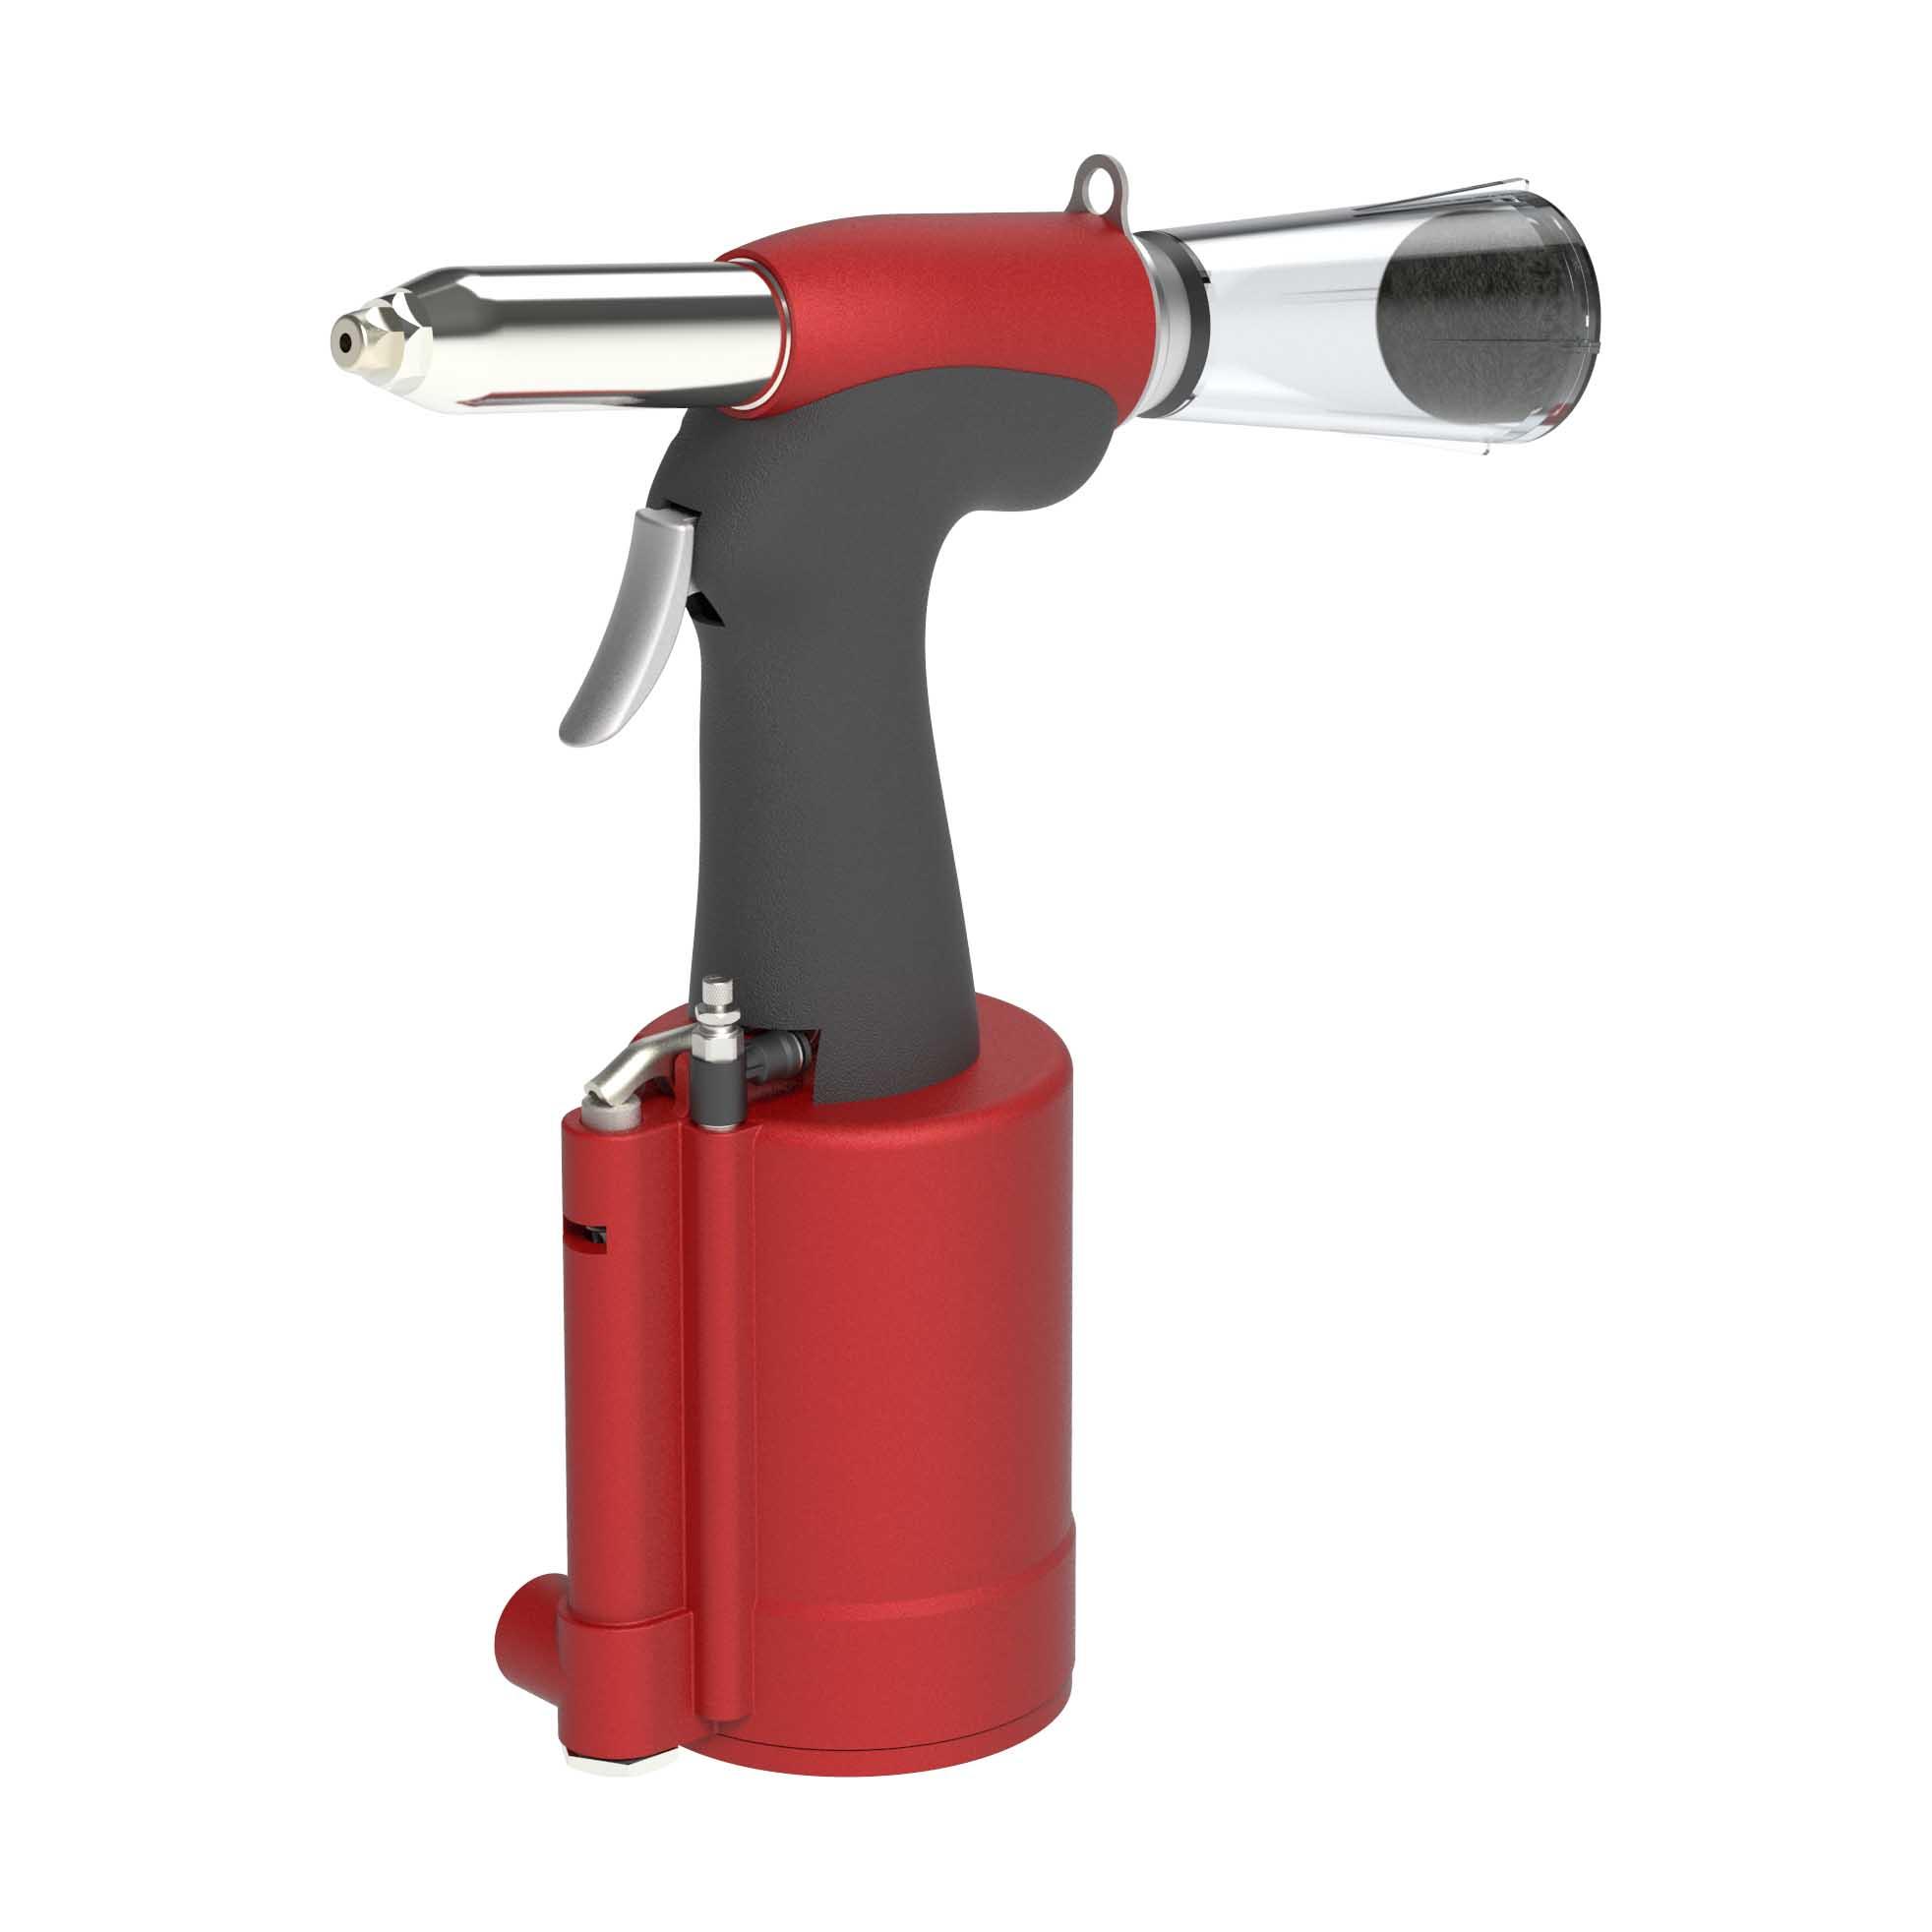 air hydraulic riveter; hydraulic riveter; central pneumatic air hydraulic riveter; hydraulic rivet squeezer; hydraulic nutsert tool; hydraulic rivet tool; hydraulic rivet nut tool; hydraulic rivnut tool; riveter; rosie the riveter; riveters; riveter definition; rosie riveter; rosie the riveter definition; we can do it woman; define rosie the riveter; what is a riveter; the riveter; rosie the riveter norman rockwell; rosie the riveter tool; female images; you can do it images; who is rosie the riveter; who was rosie the riveter; riveter rosie; rosie the riveter ww2; betty the riveter; rosie the riveter facts; rosie the riveter history; rosie the; rosie the riveter year; women can do it; rosie the riveter represented;